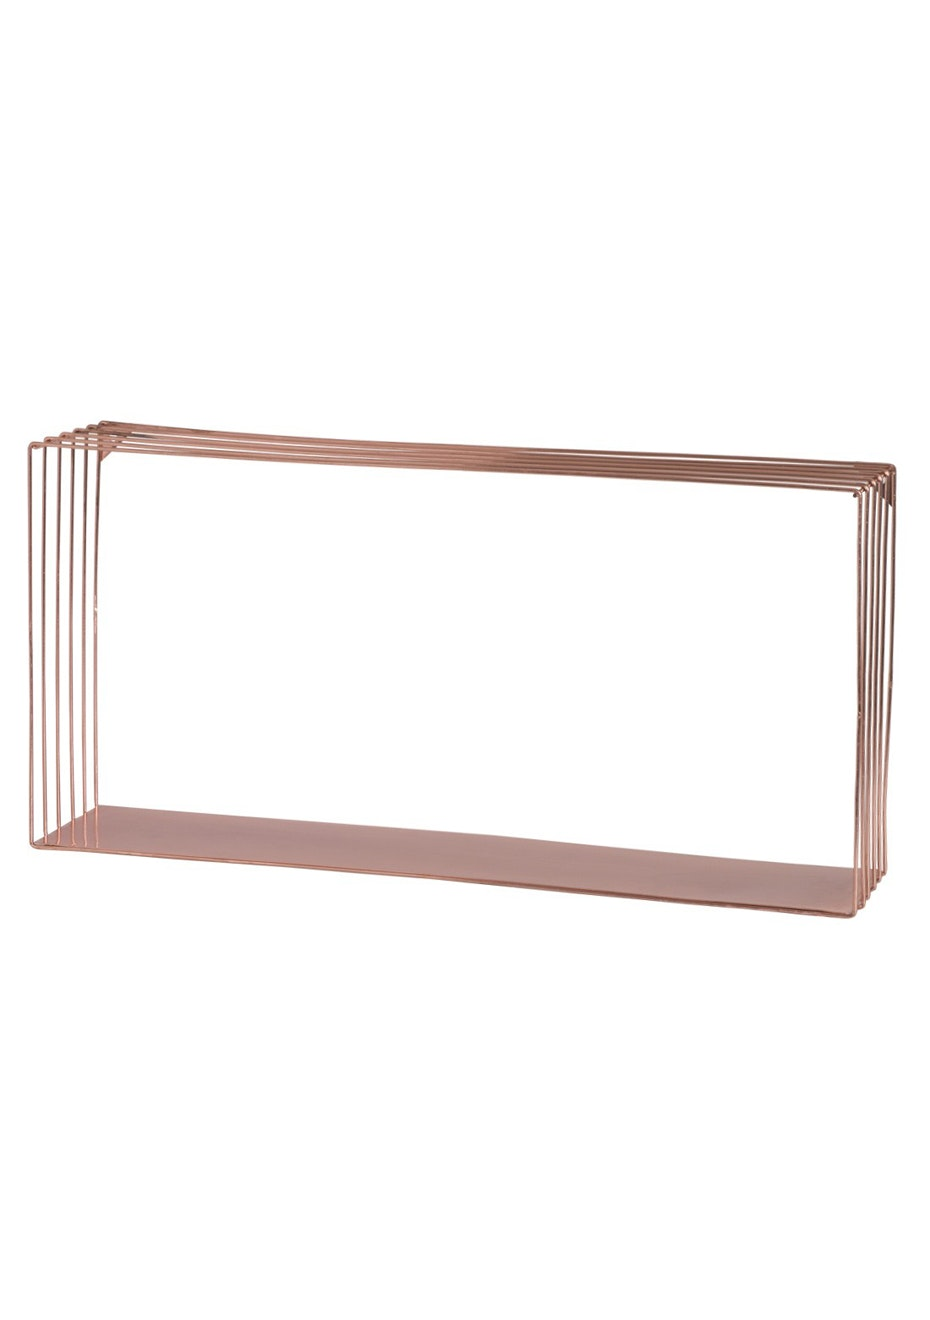 Jason - Copper shelf - Copper